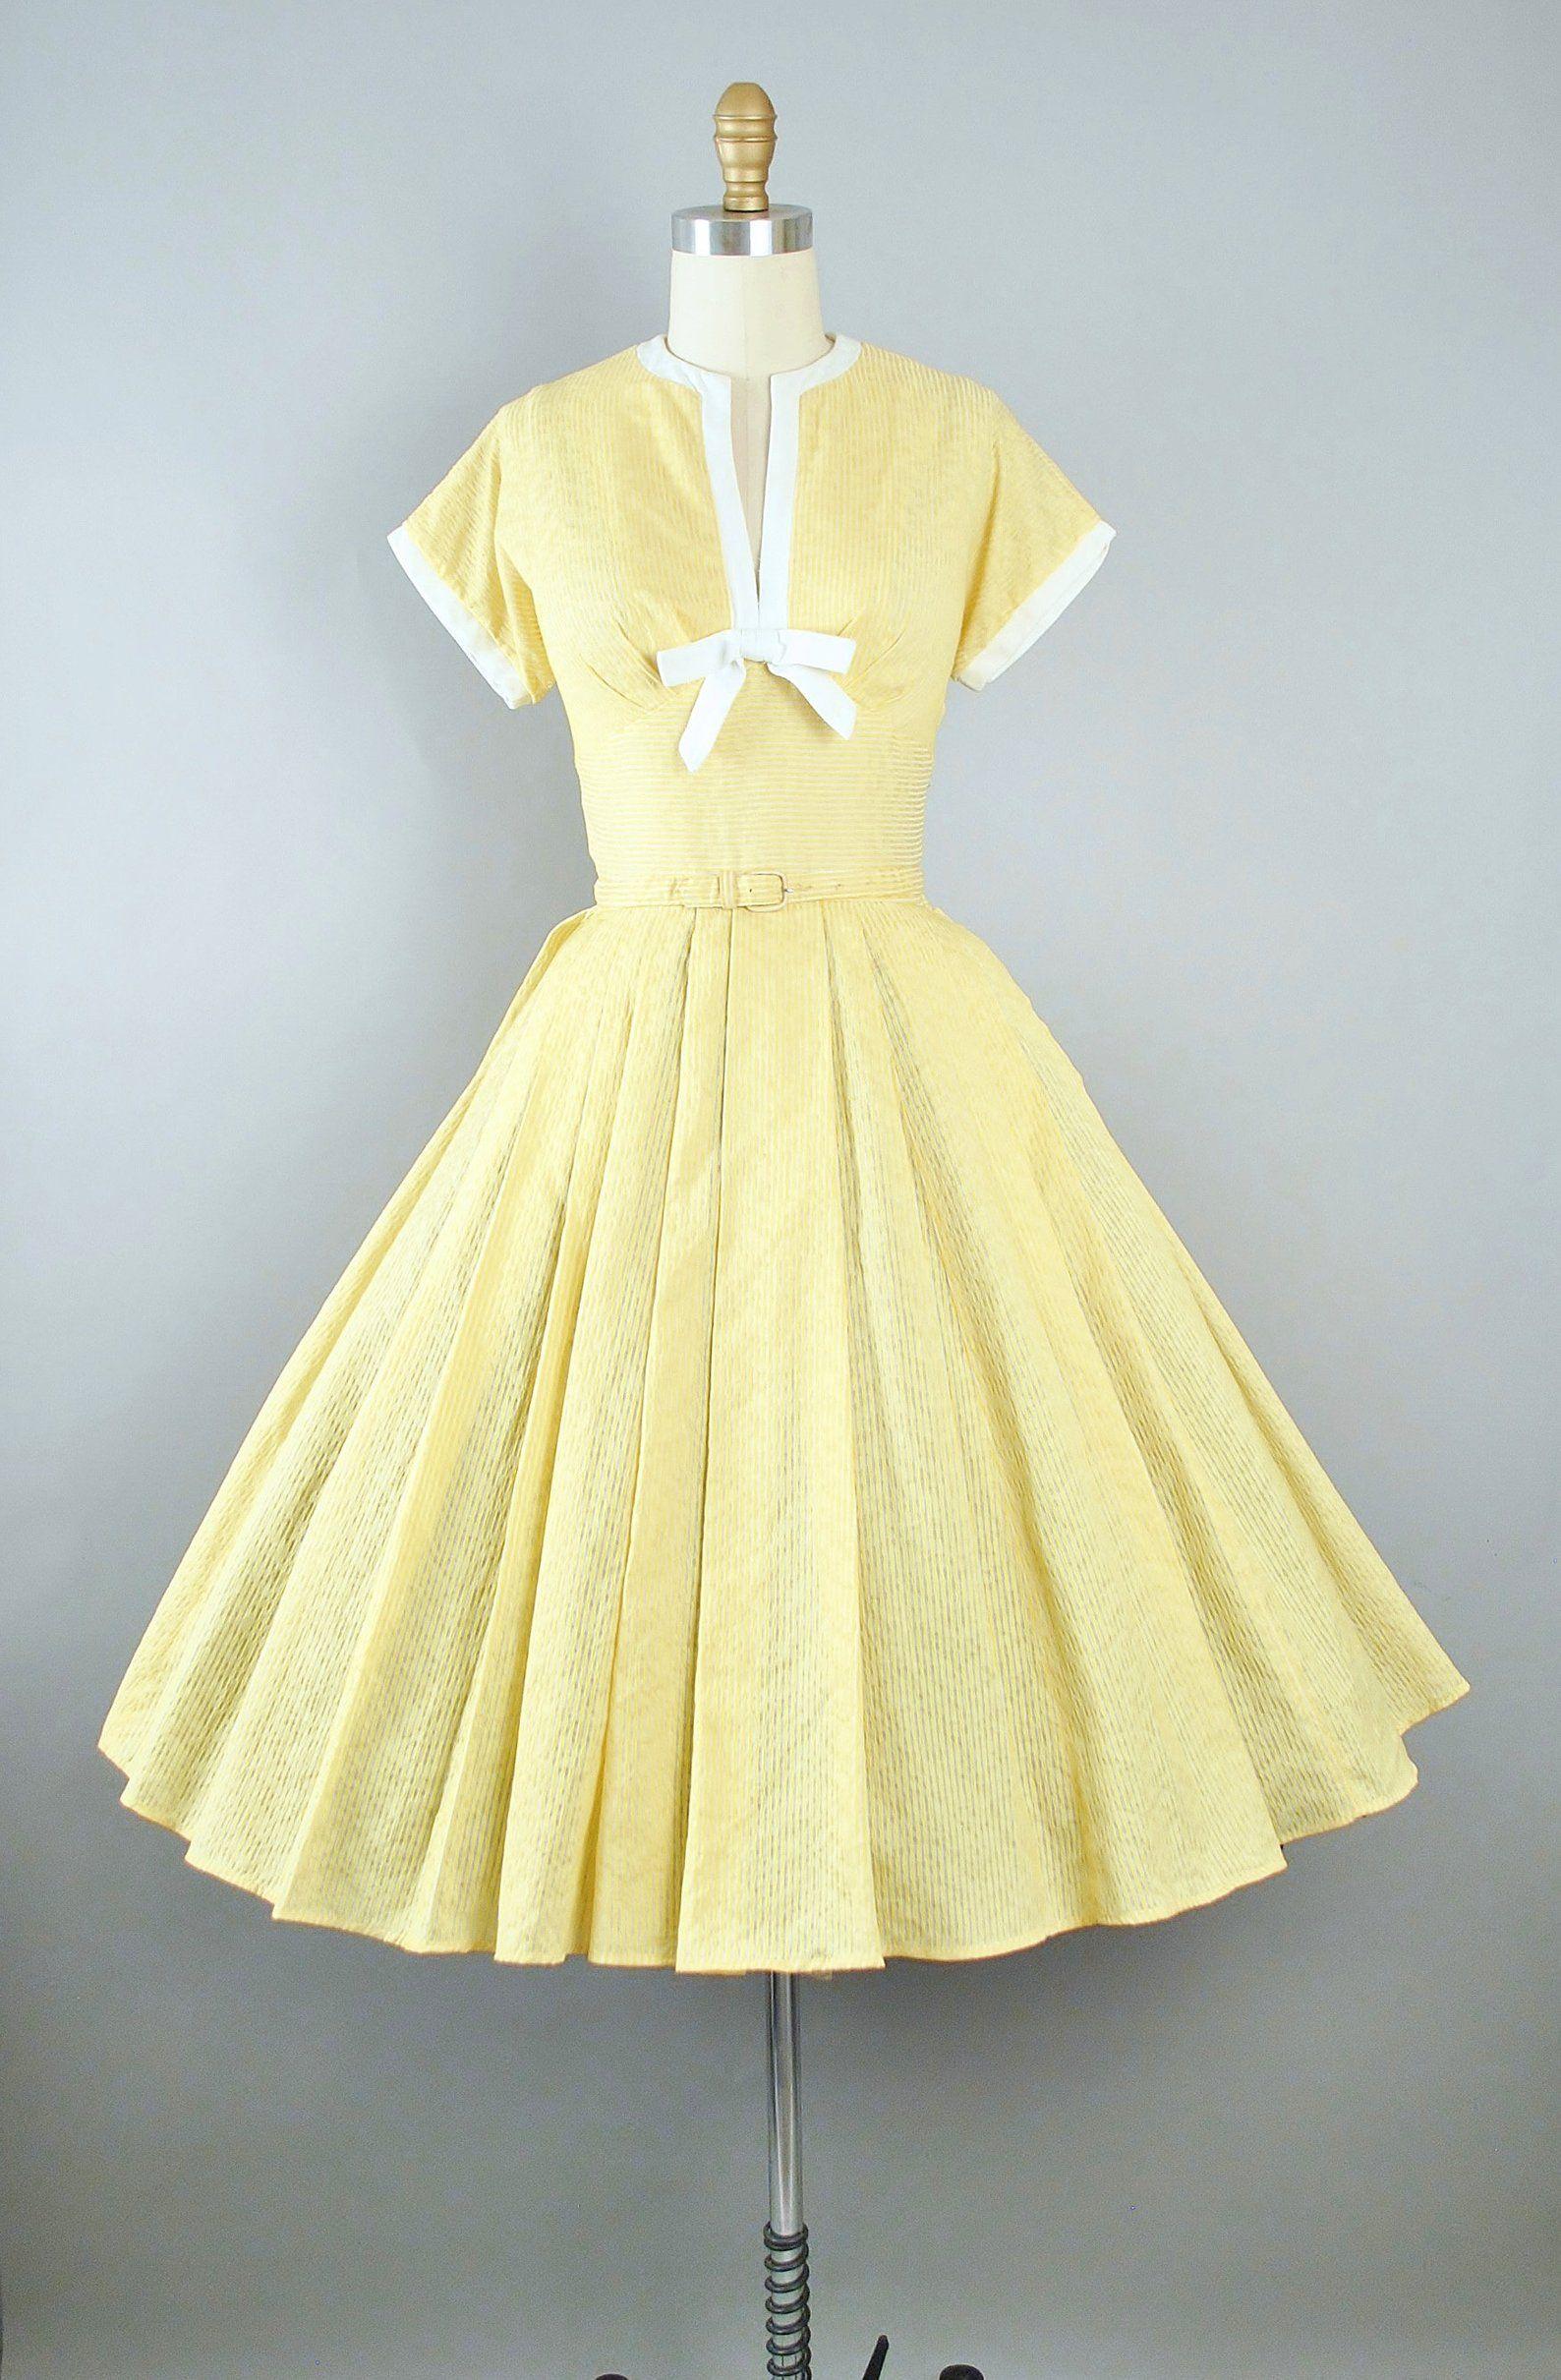 Vintage 50s Dress 1950s Yellow Cotton Sundress Textured Etsy Cotton Sundress 1950s Dress Vintage 1950s Dresses [ 2421 x 1588 Pixel ]